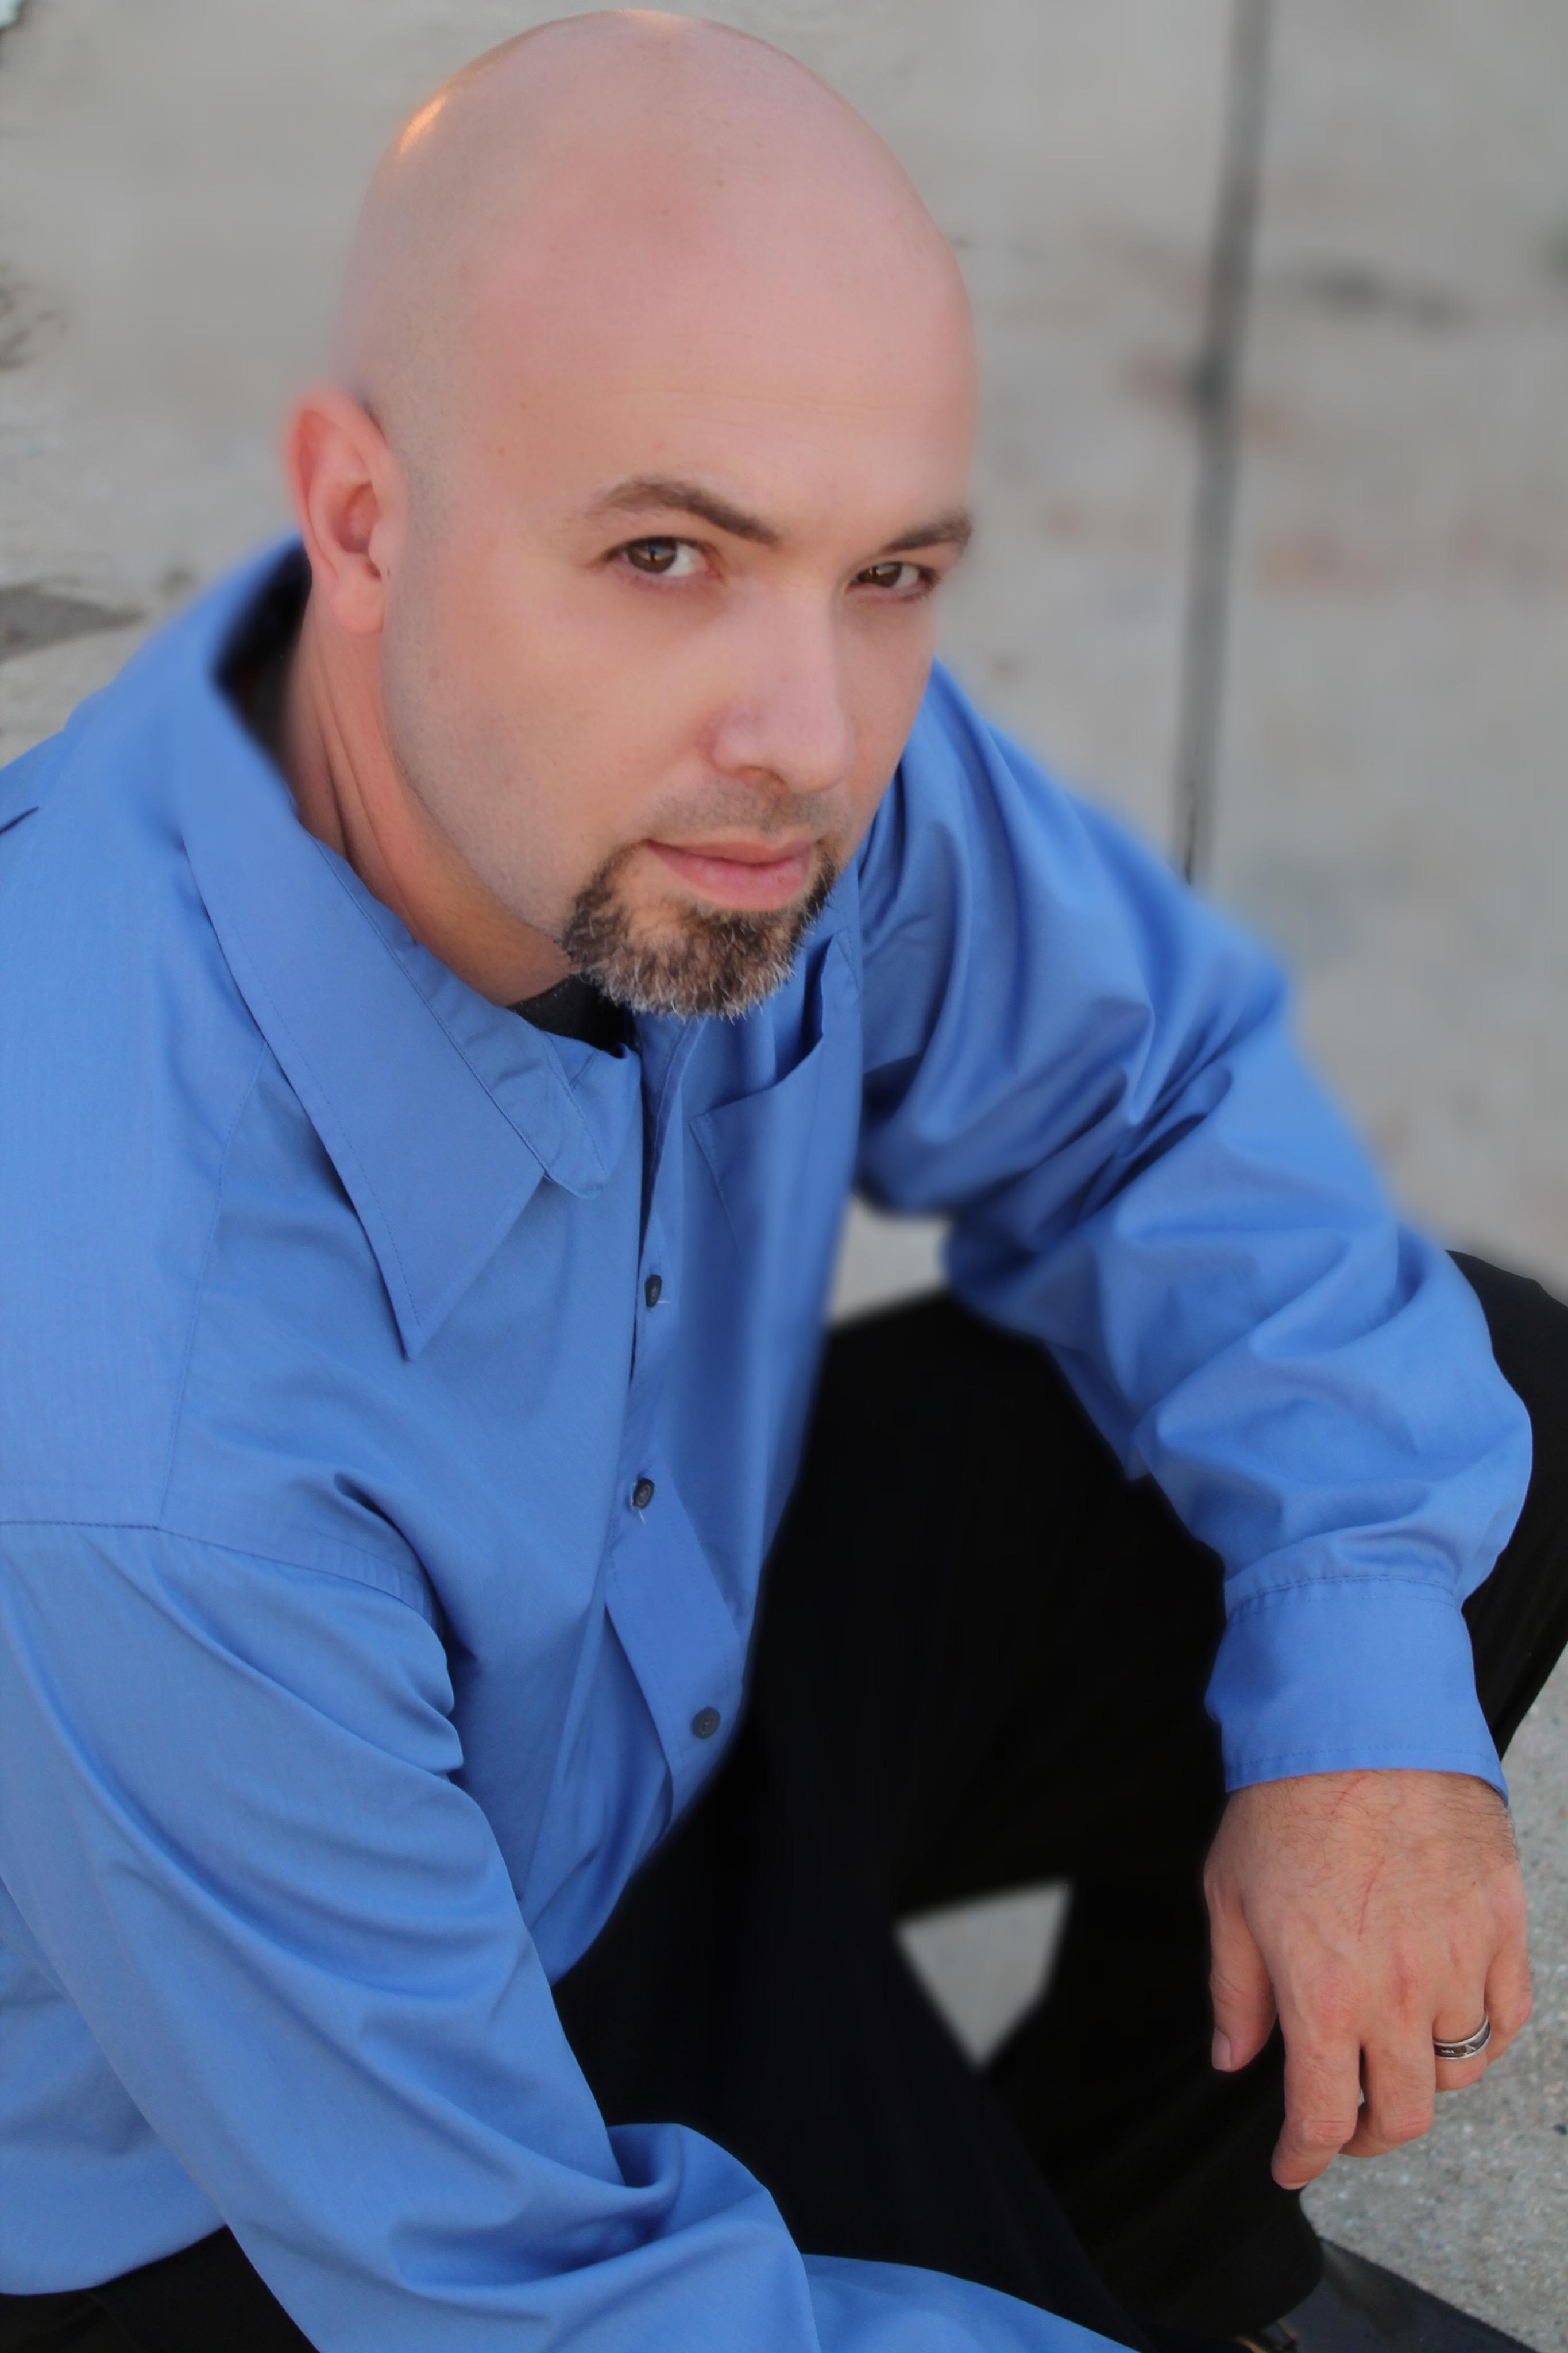 Jason Robbins